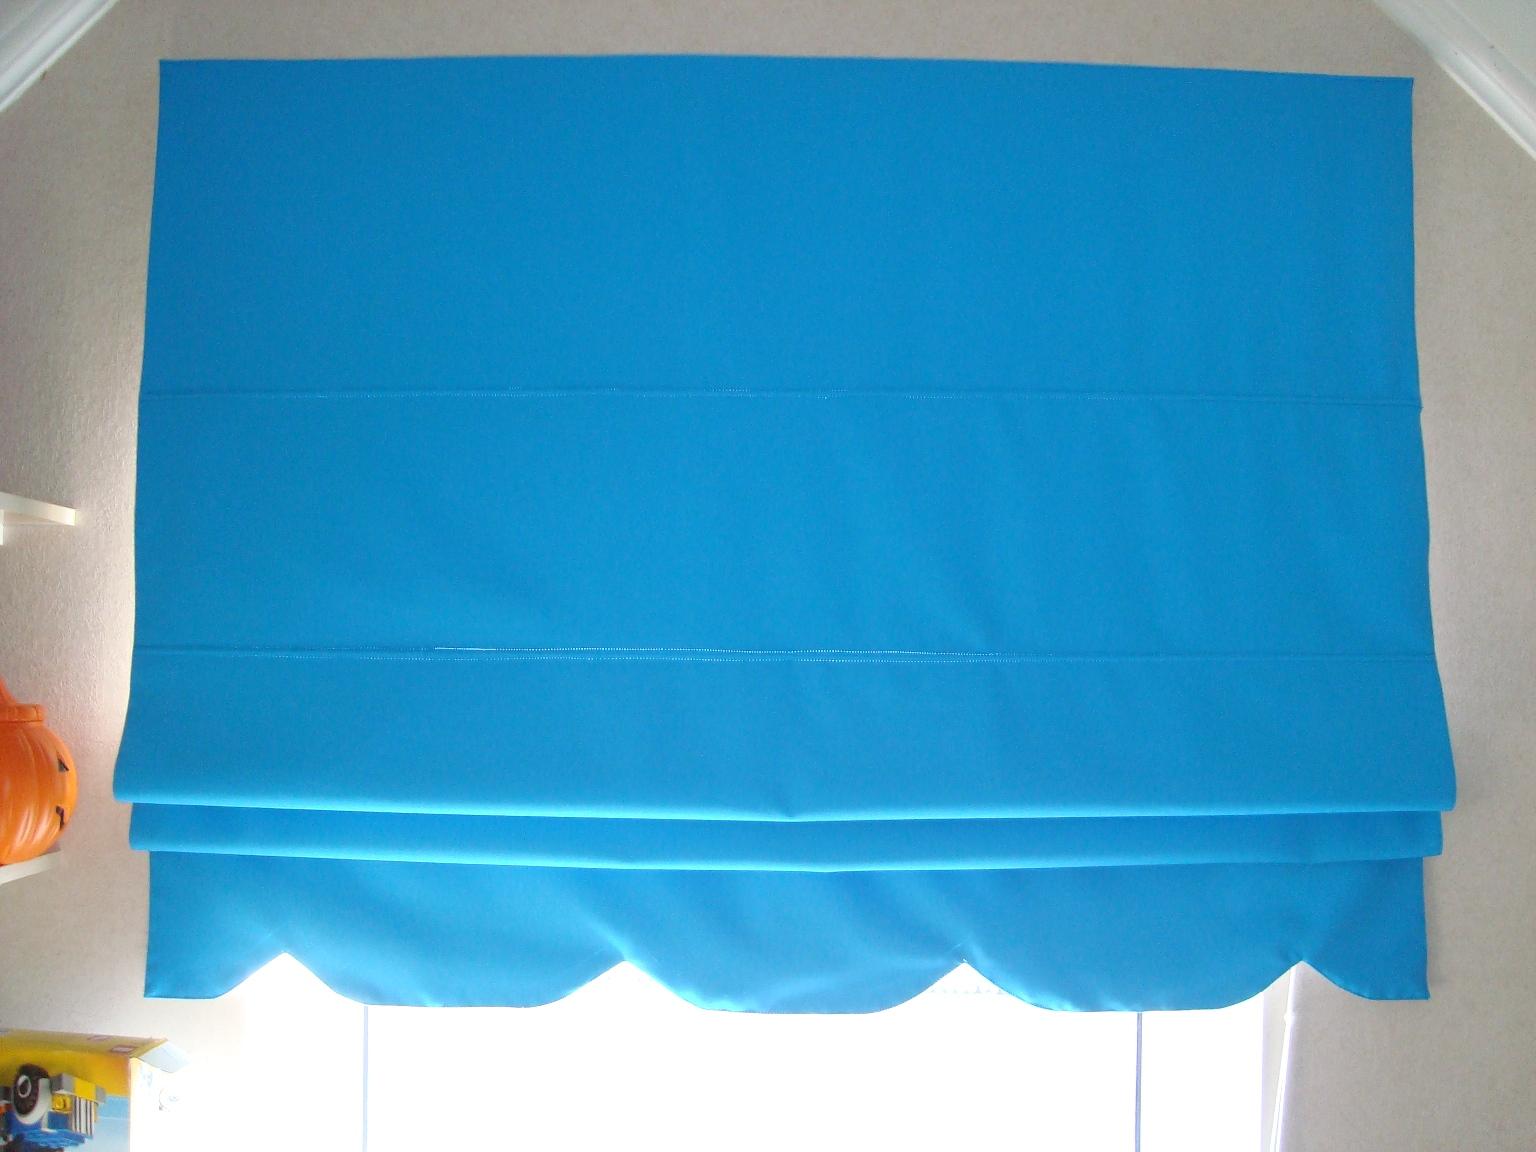 Decoracion cortinas store dormitorio ni os - Cortinas store infantiles ...